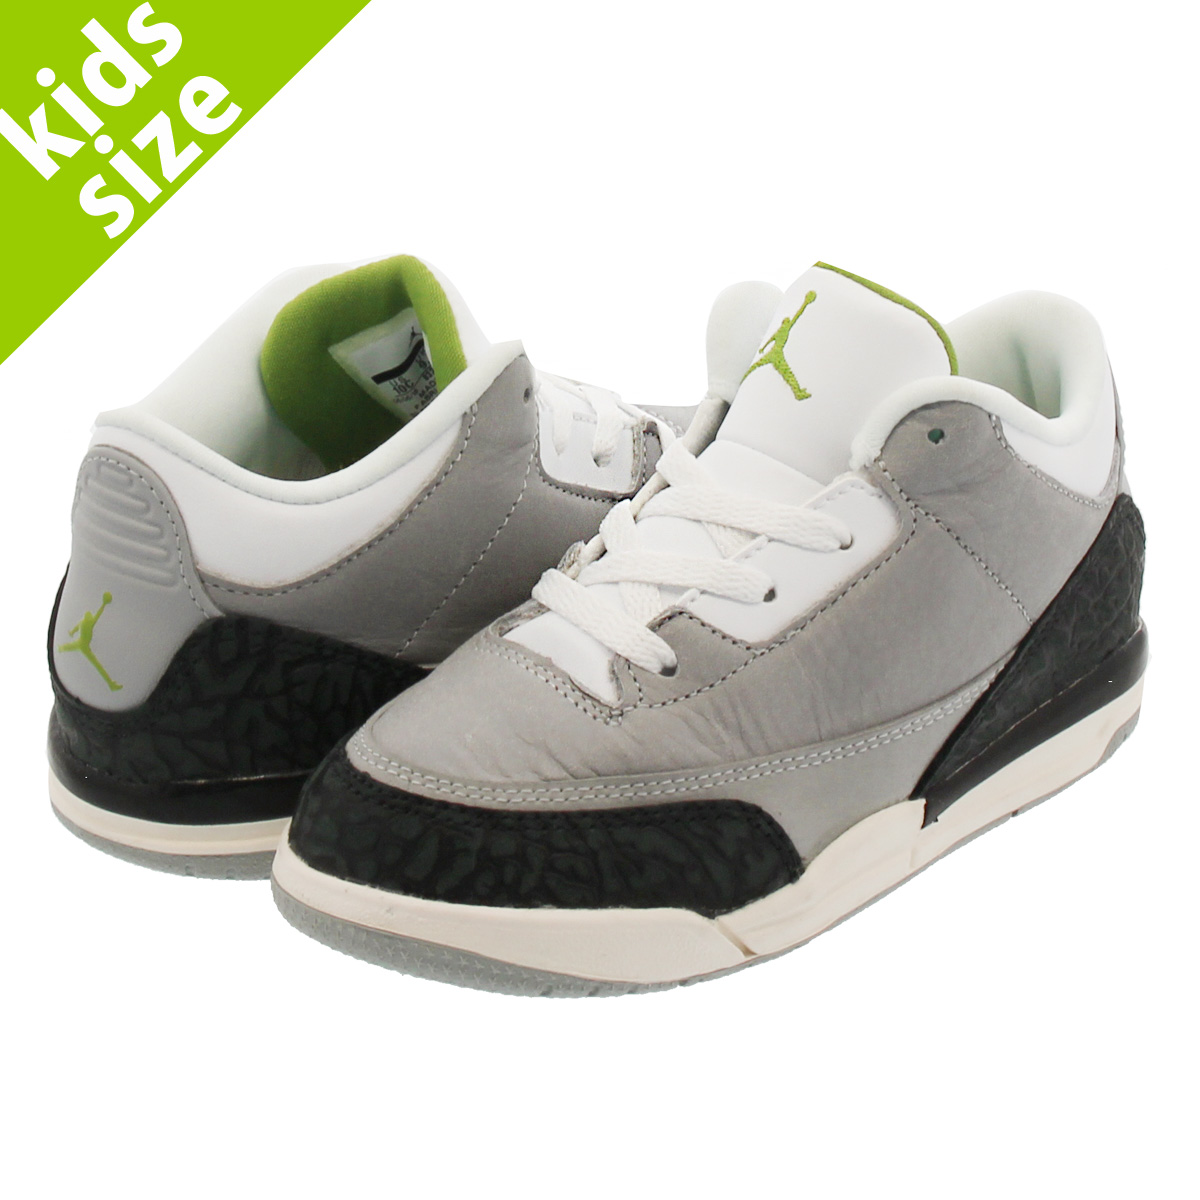 067cfec56ab142 NIKE AIR JORDAN 3 RETRO BT Nike Air Jordan 3 nostalgic BT LIGHT SMOKE GREY  CHLOROPHYLL BLACK WHITE 832